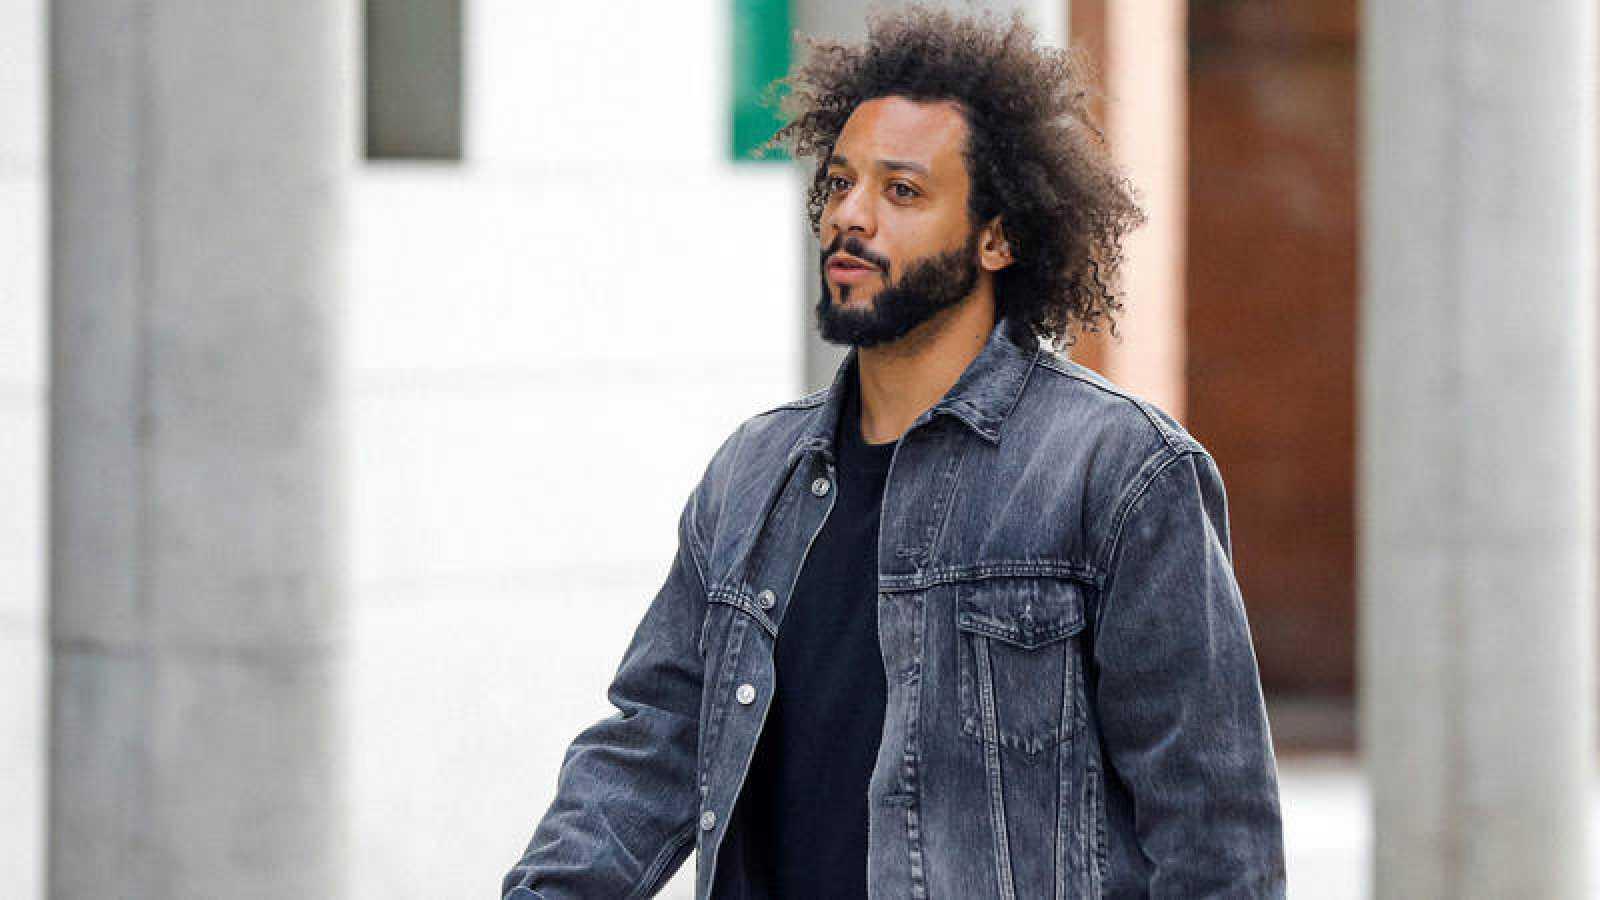 Marcelo a juicio por conducir sin puntos.